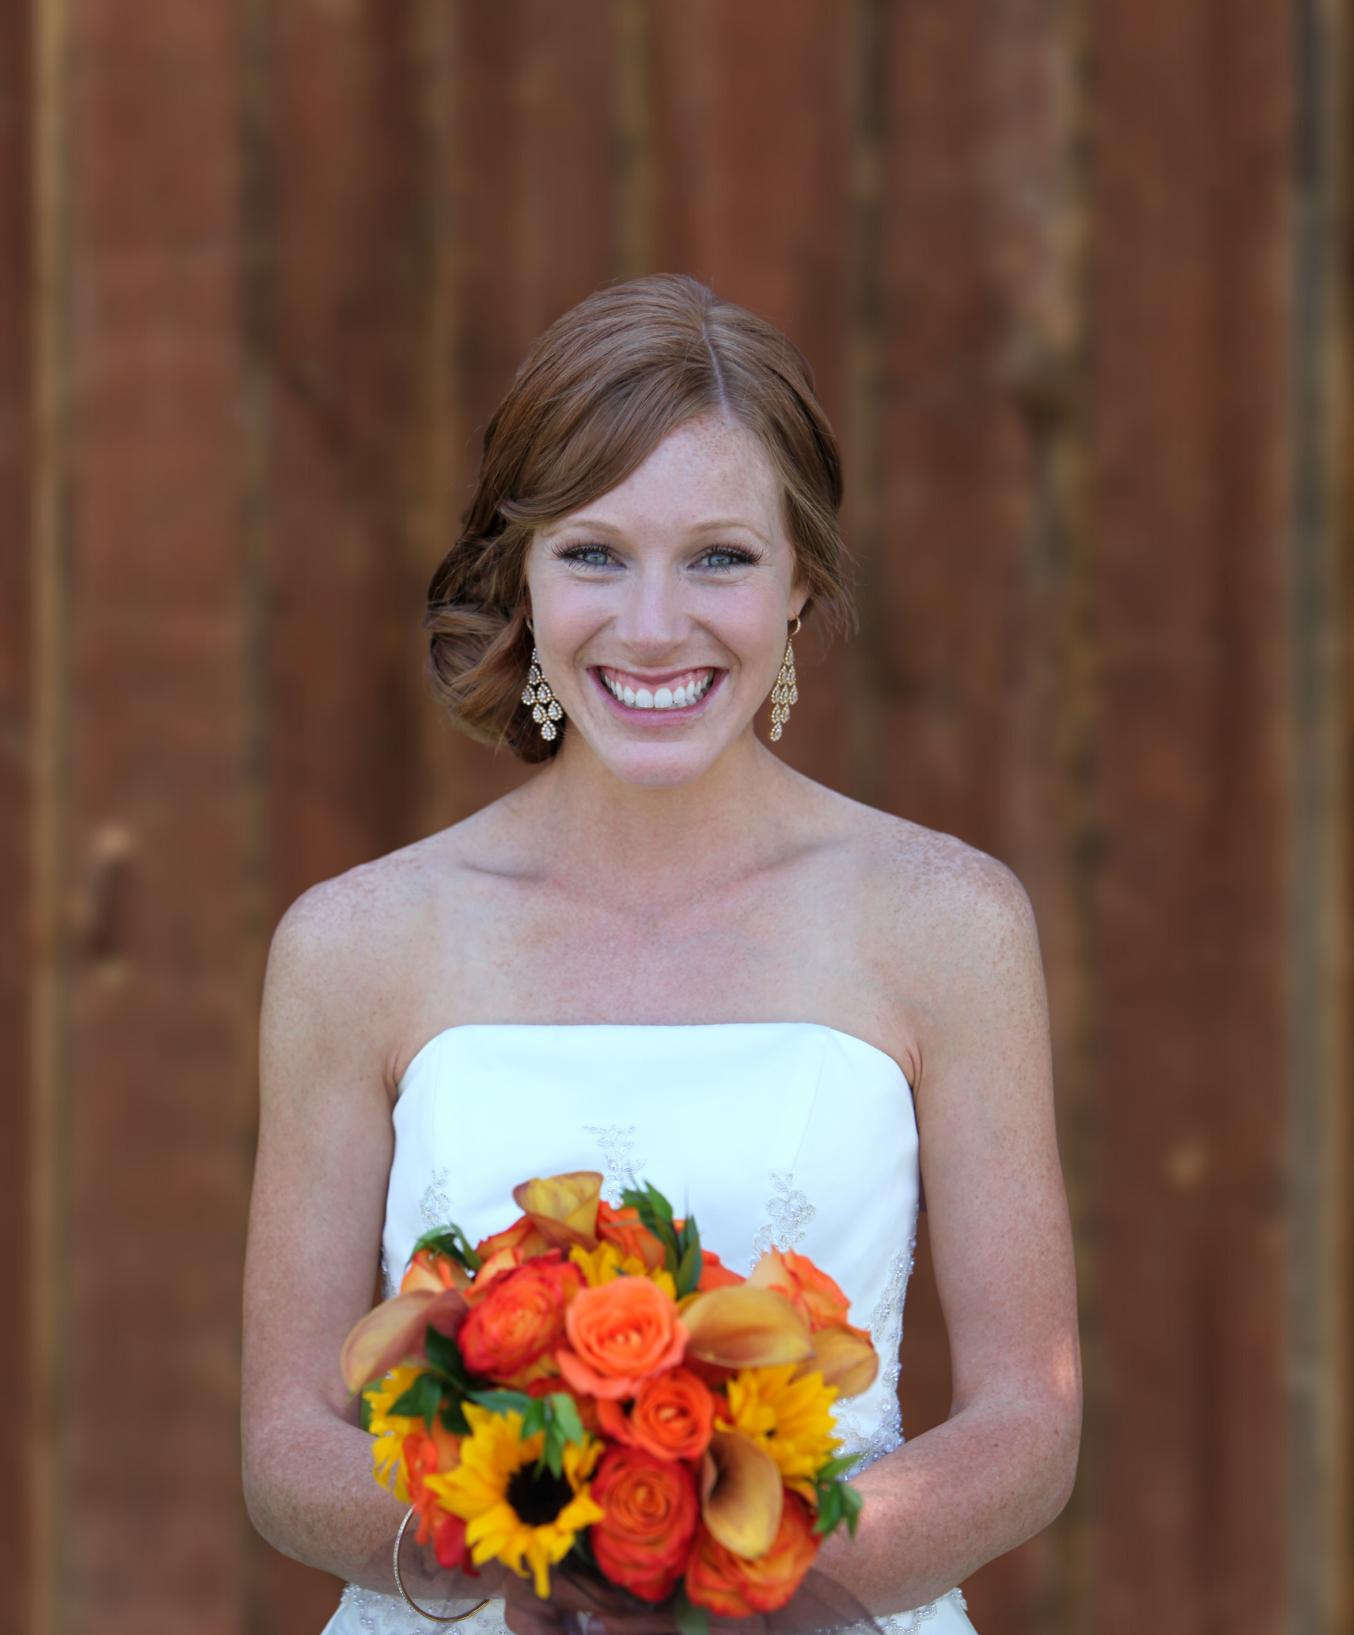 https://gordonsprings.com/wp-content/uploads/2021/07/bride-barn-2.png